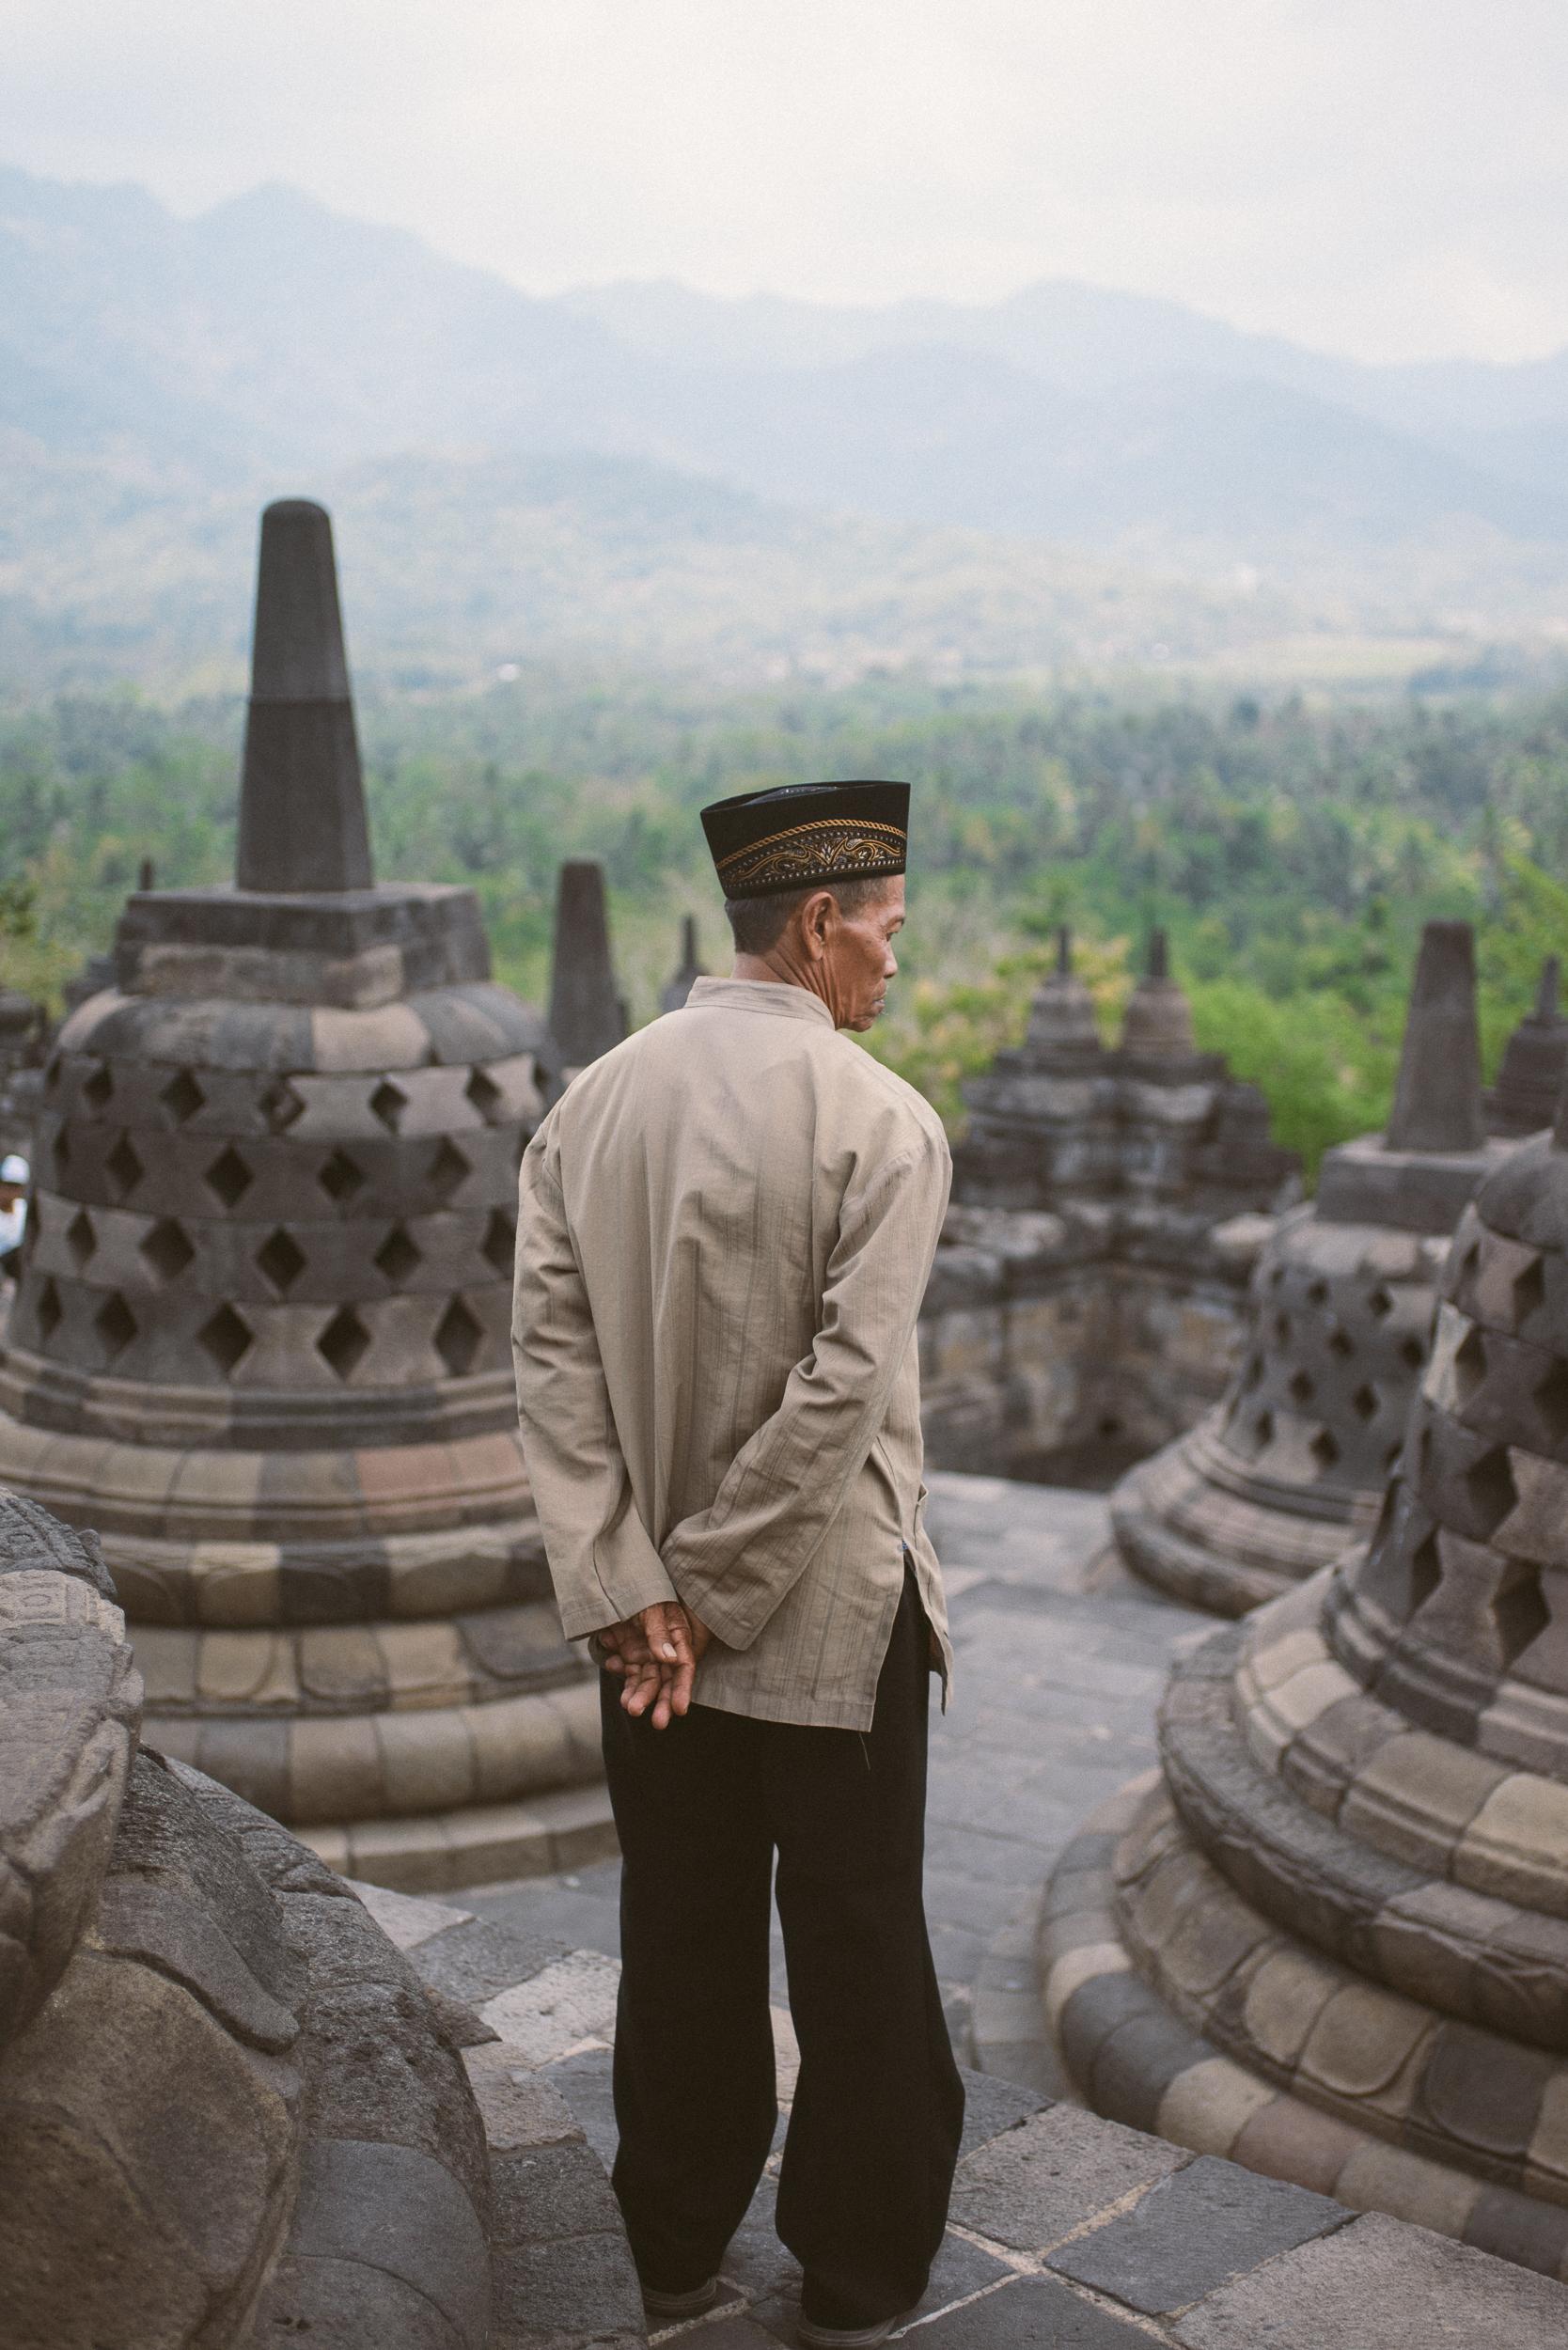 ASHarris_SQUARESPACE-Indonesia_DSC_9387-Edit.jpg